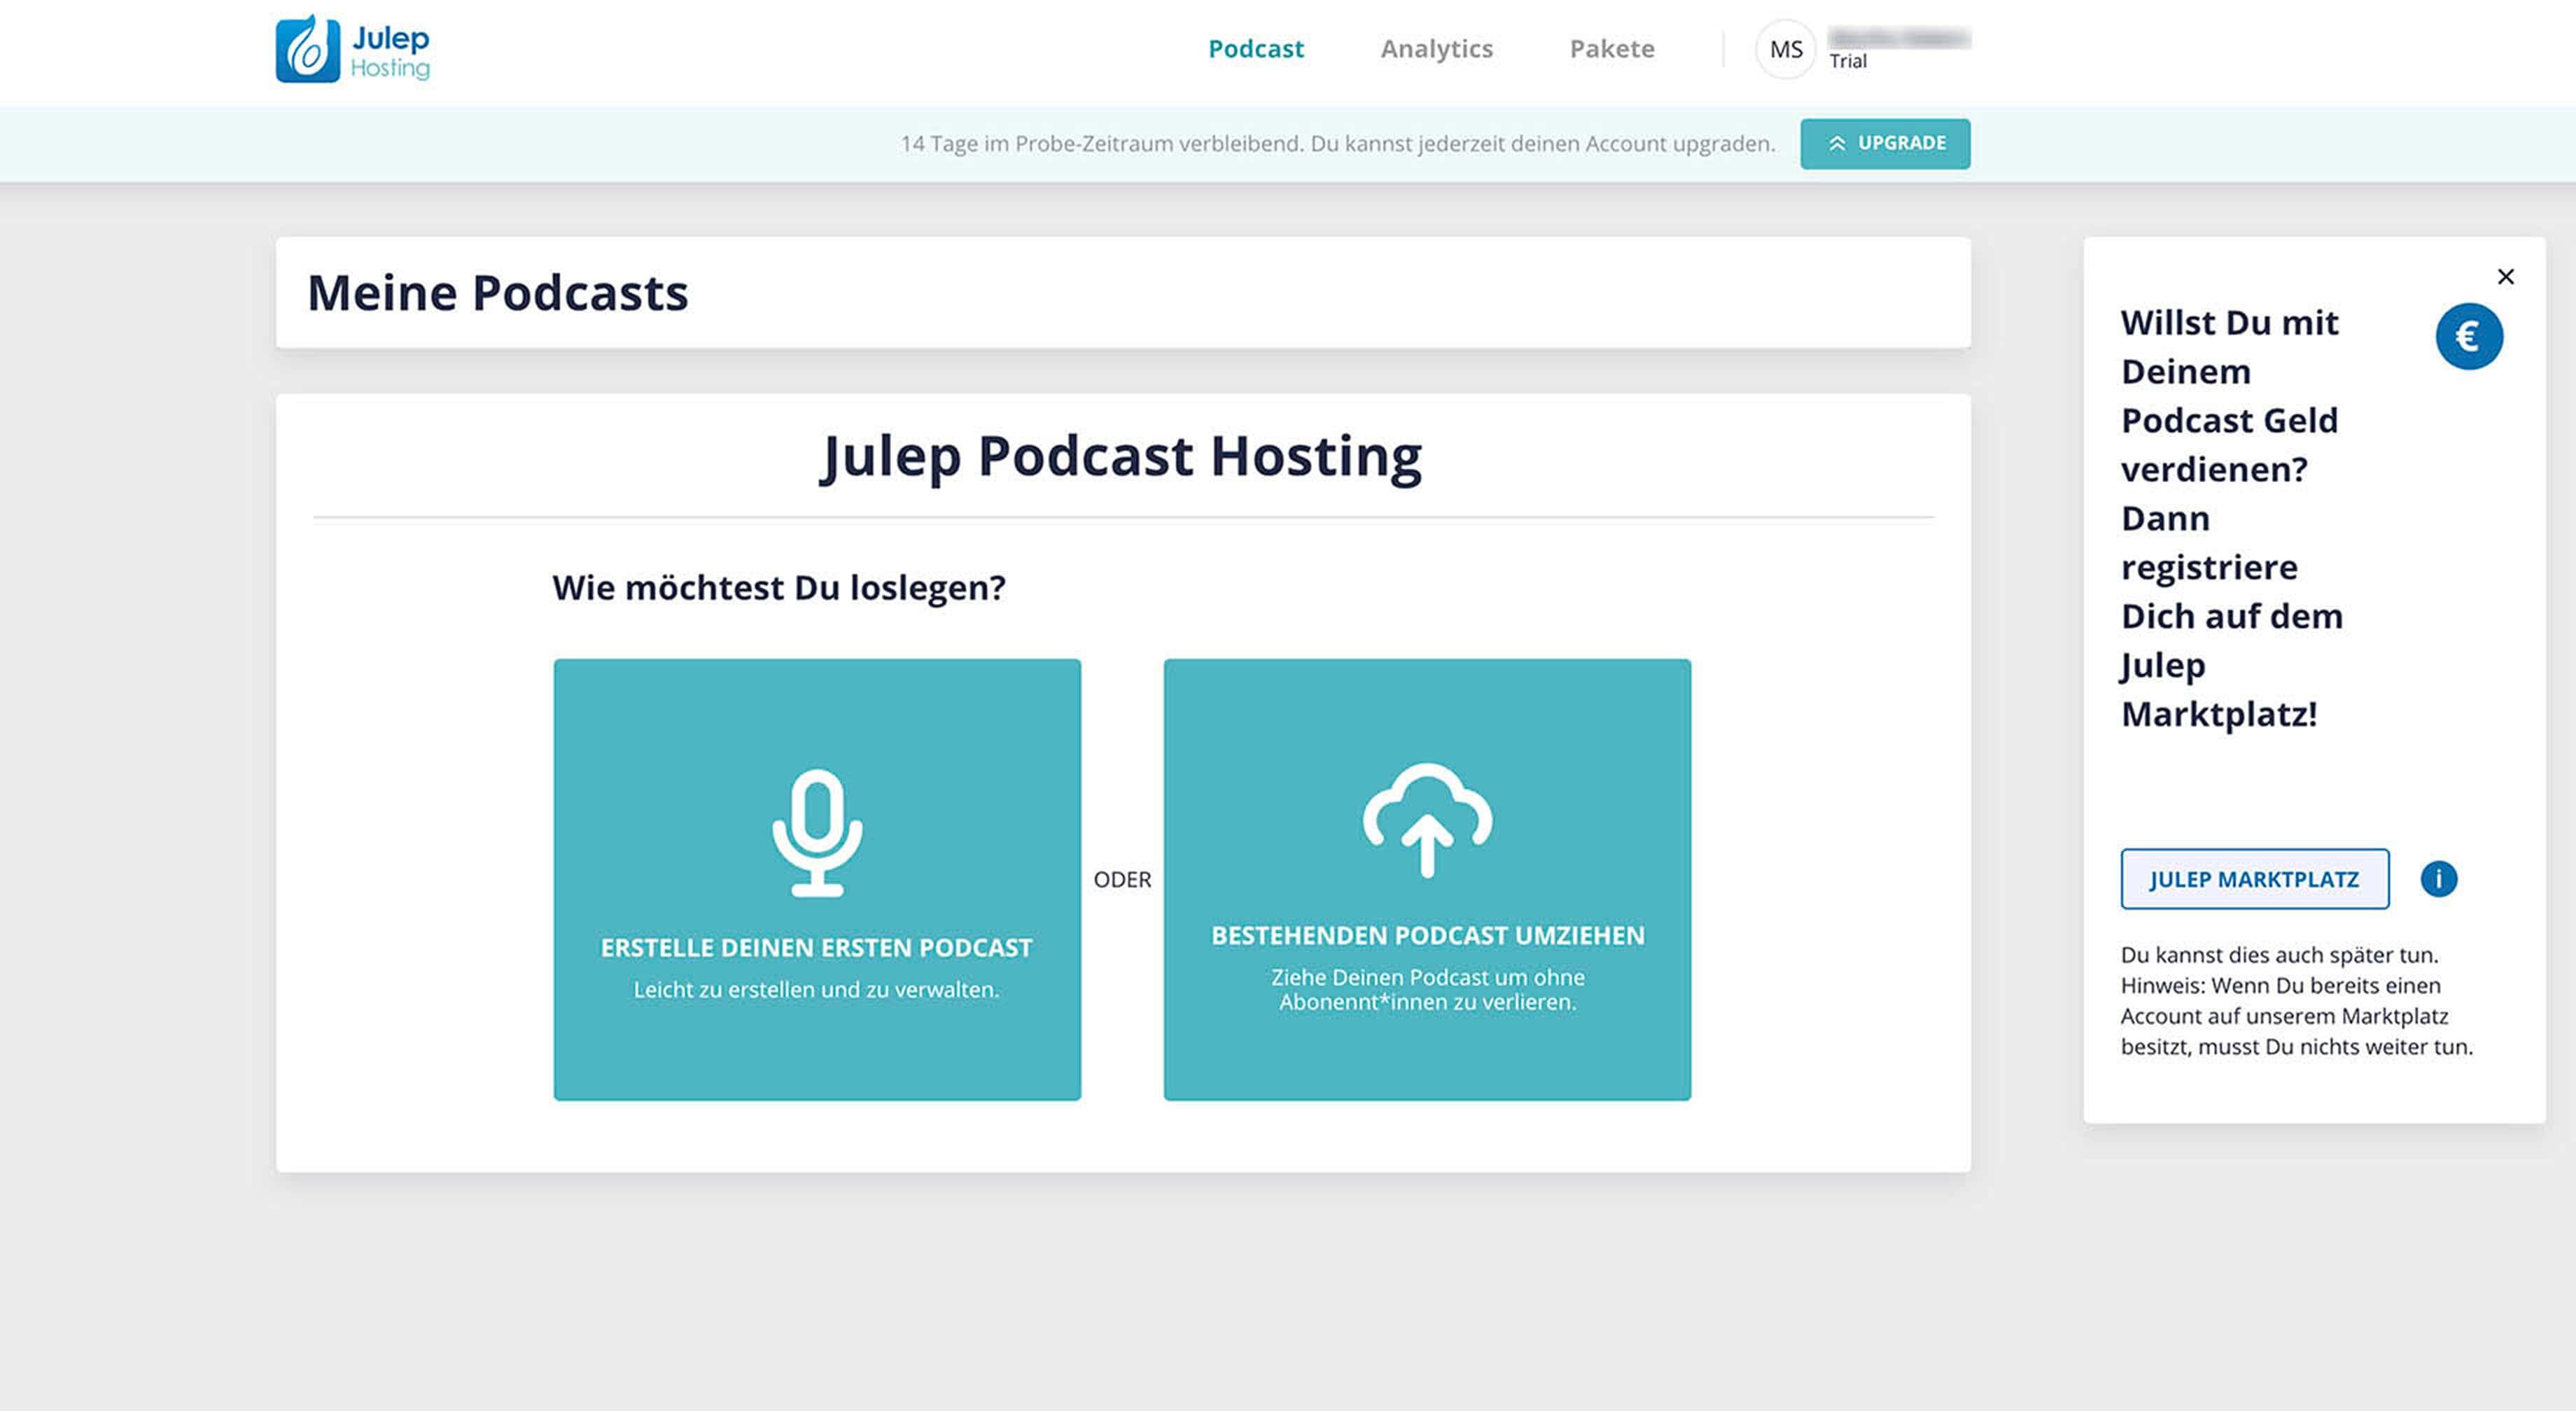 Julep_podcast_hosting_desktop_slider_c@2x.jpg